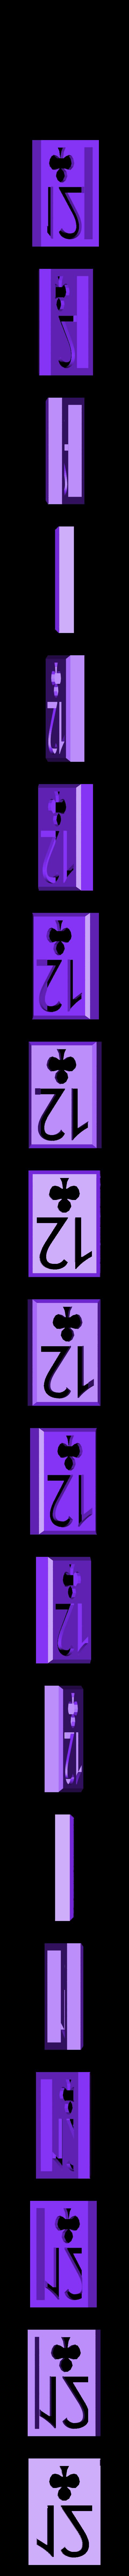 BlockClubs12.stl Download STL file Playing Card Tiles • Object to 3D print, Jinja